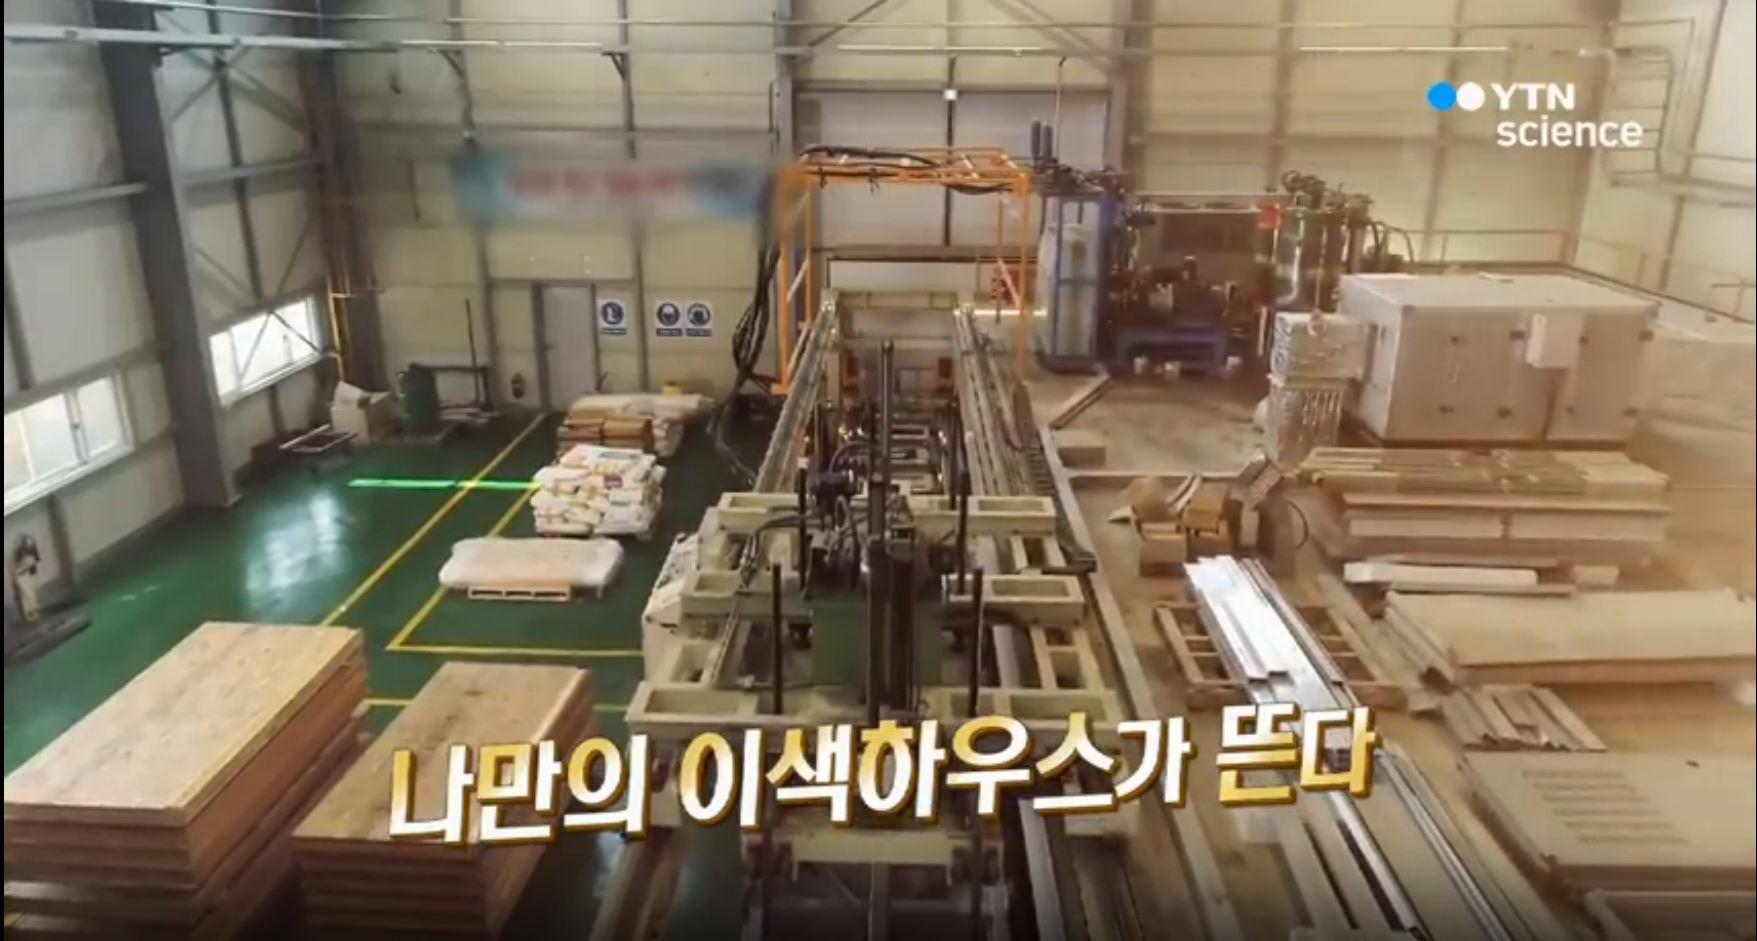 [TV방송]YTN 황금나침반 '2017 이색하우스(폴리캠하우스)' 편